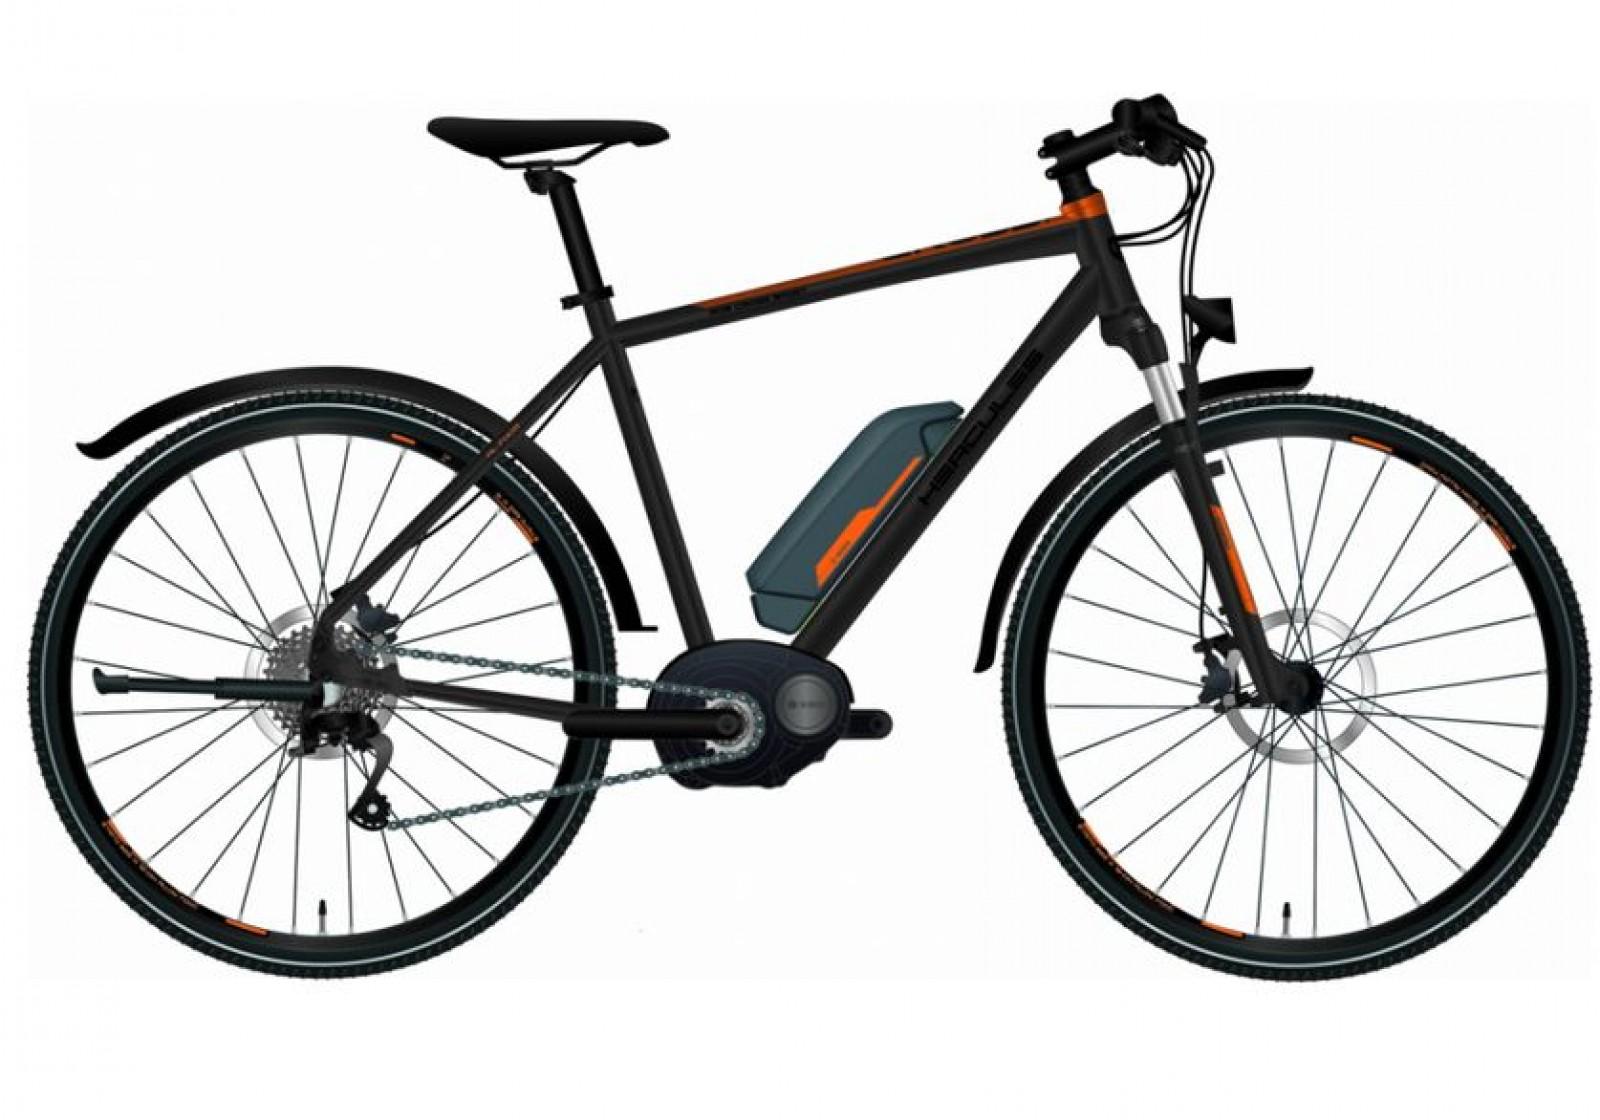 hercules e bike rob cross sport diamond 28 inches t. Black Bedroom Furniture Sets. Home Design Ideas